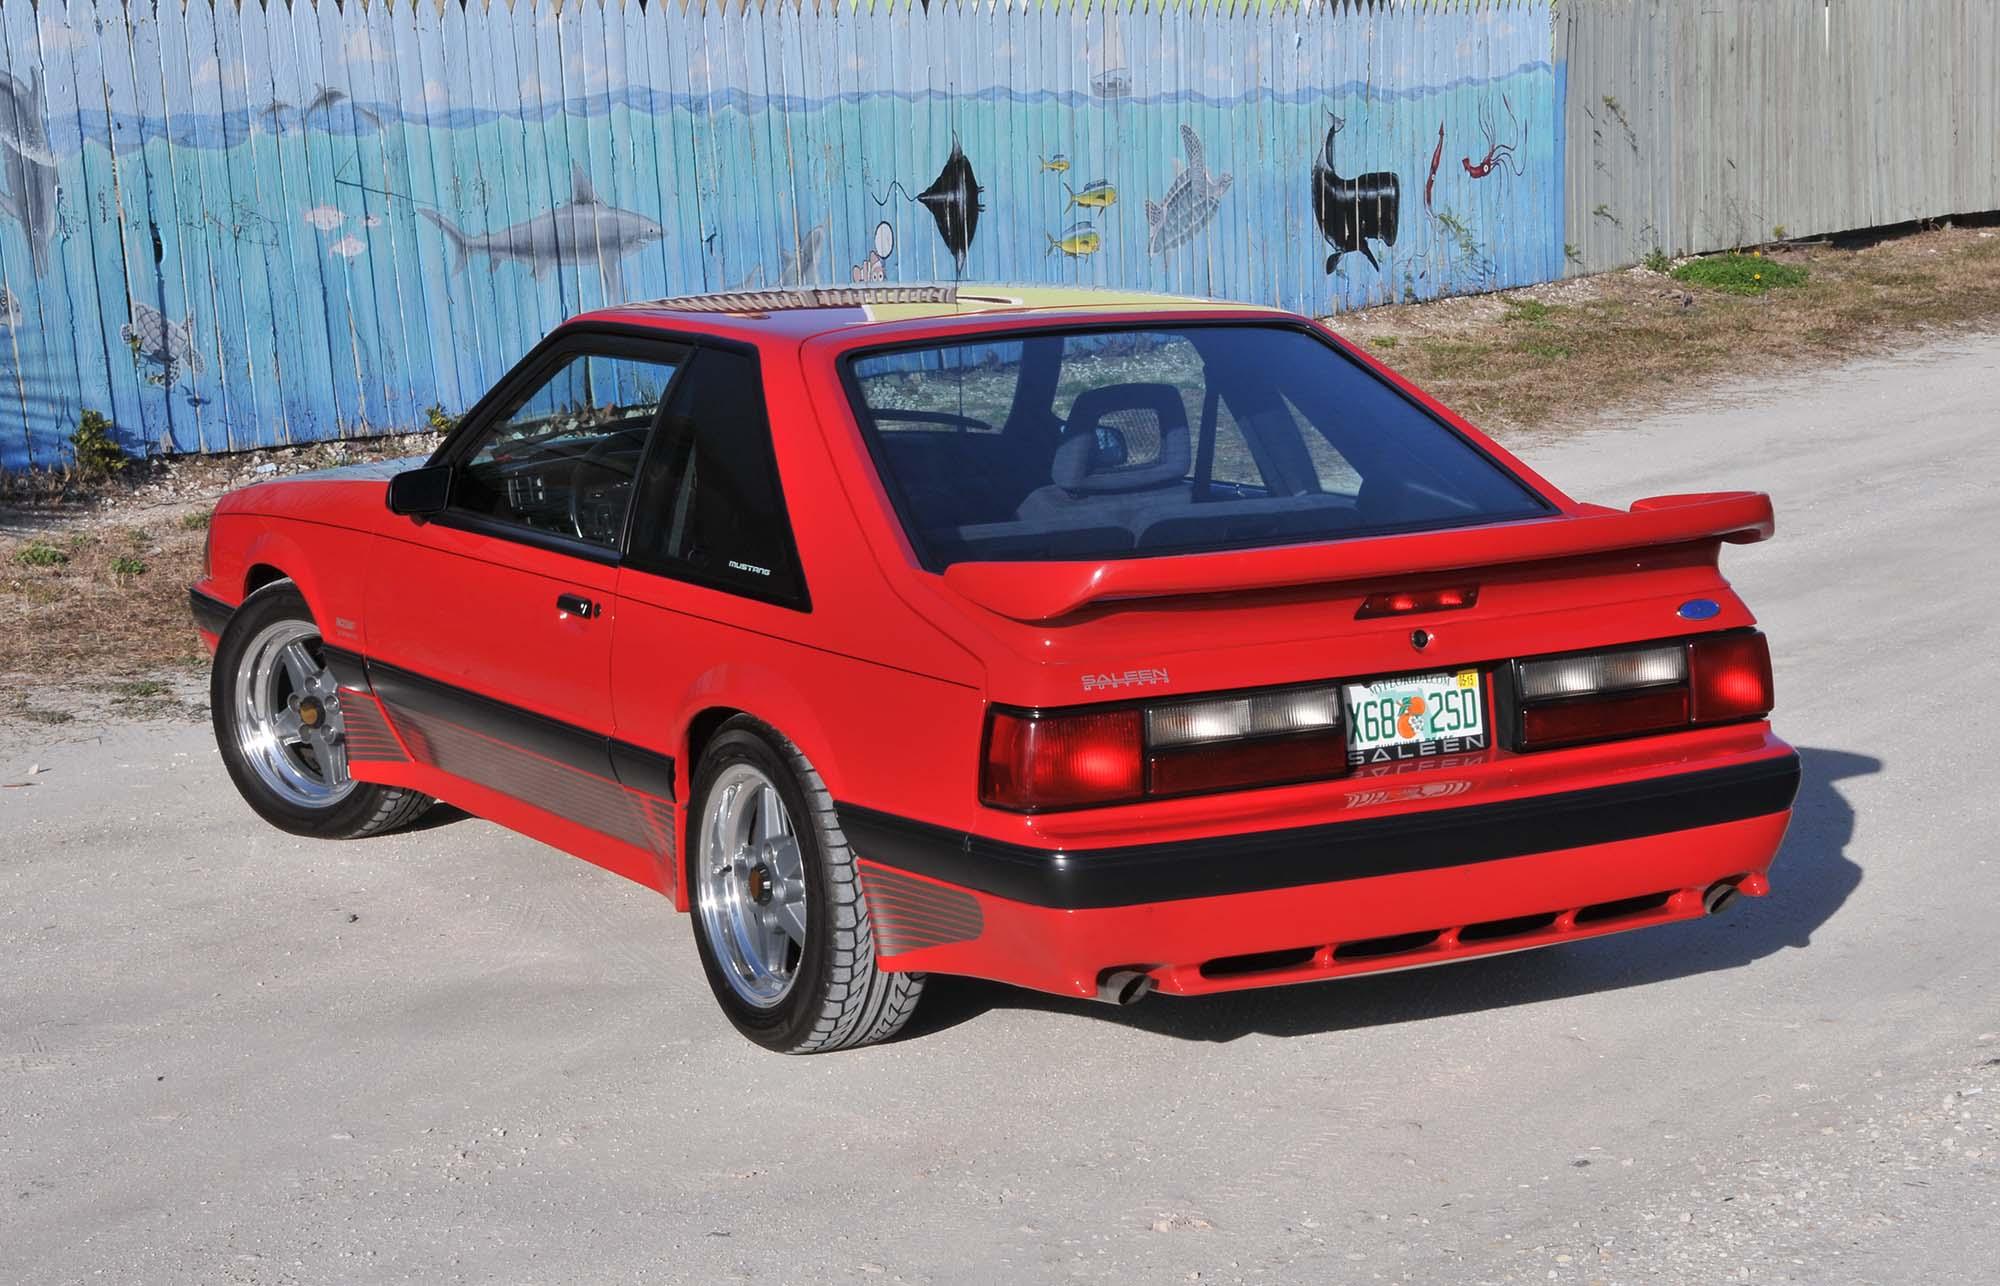 Bright Red 1990 Mustang rear